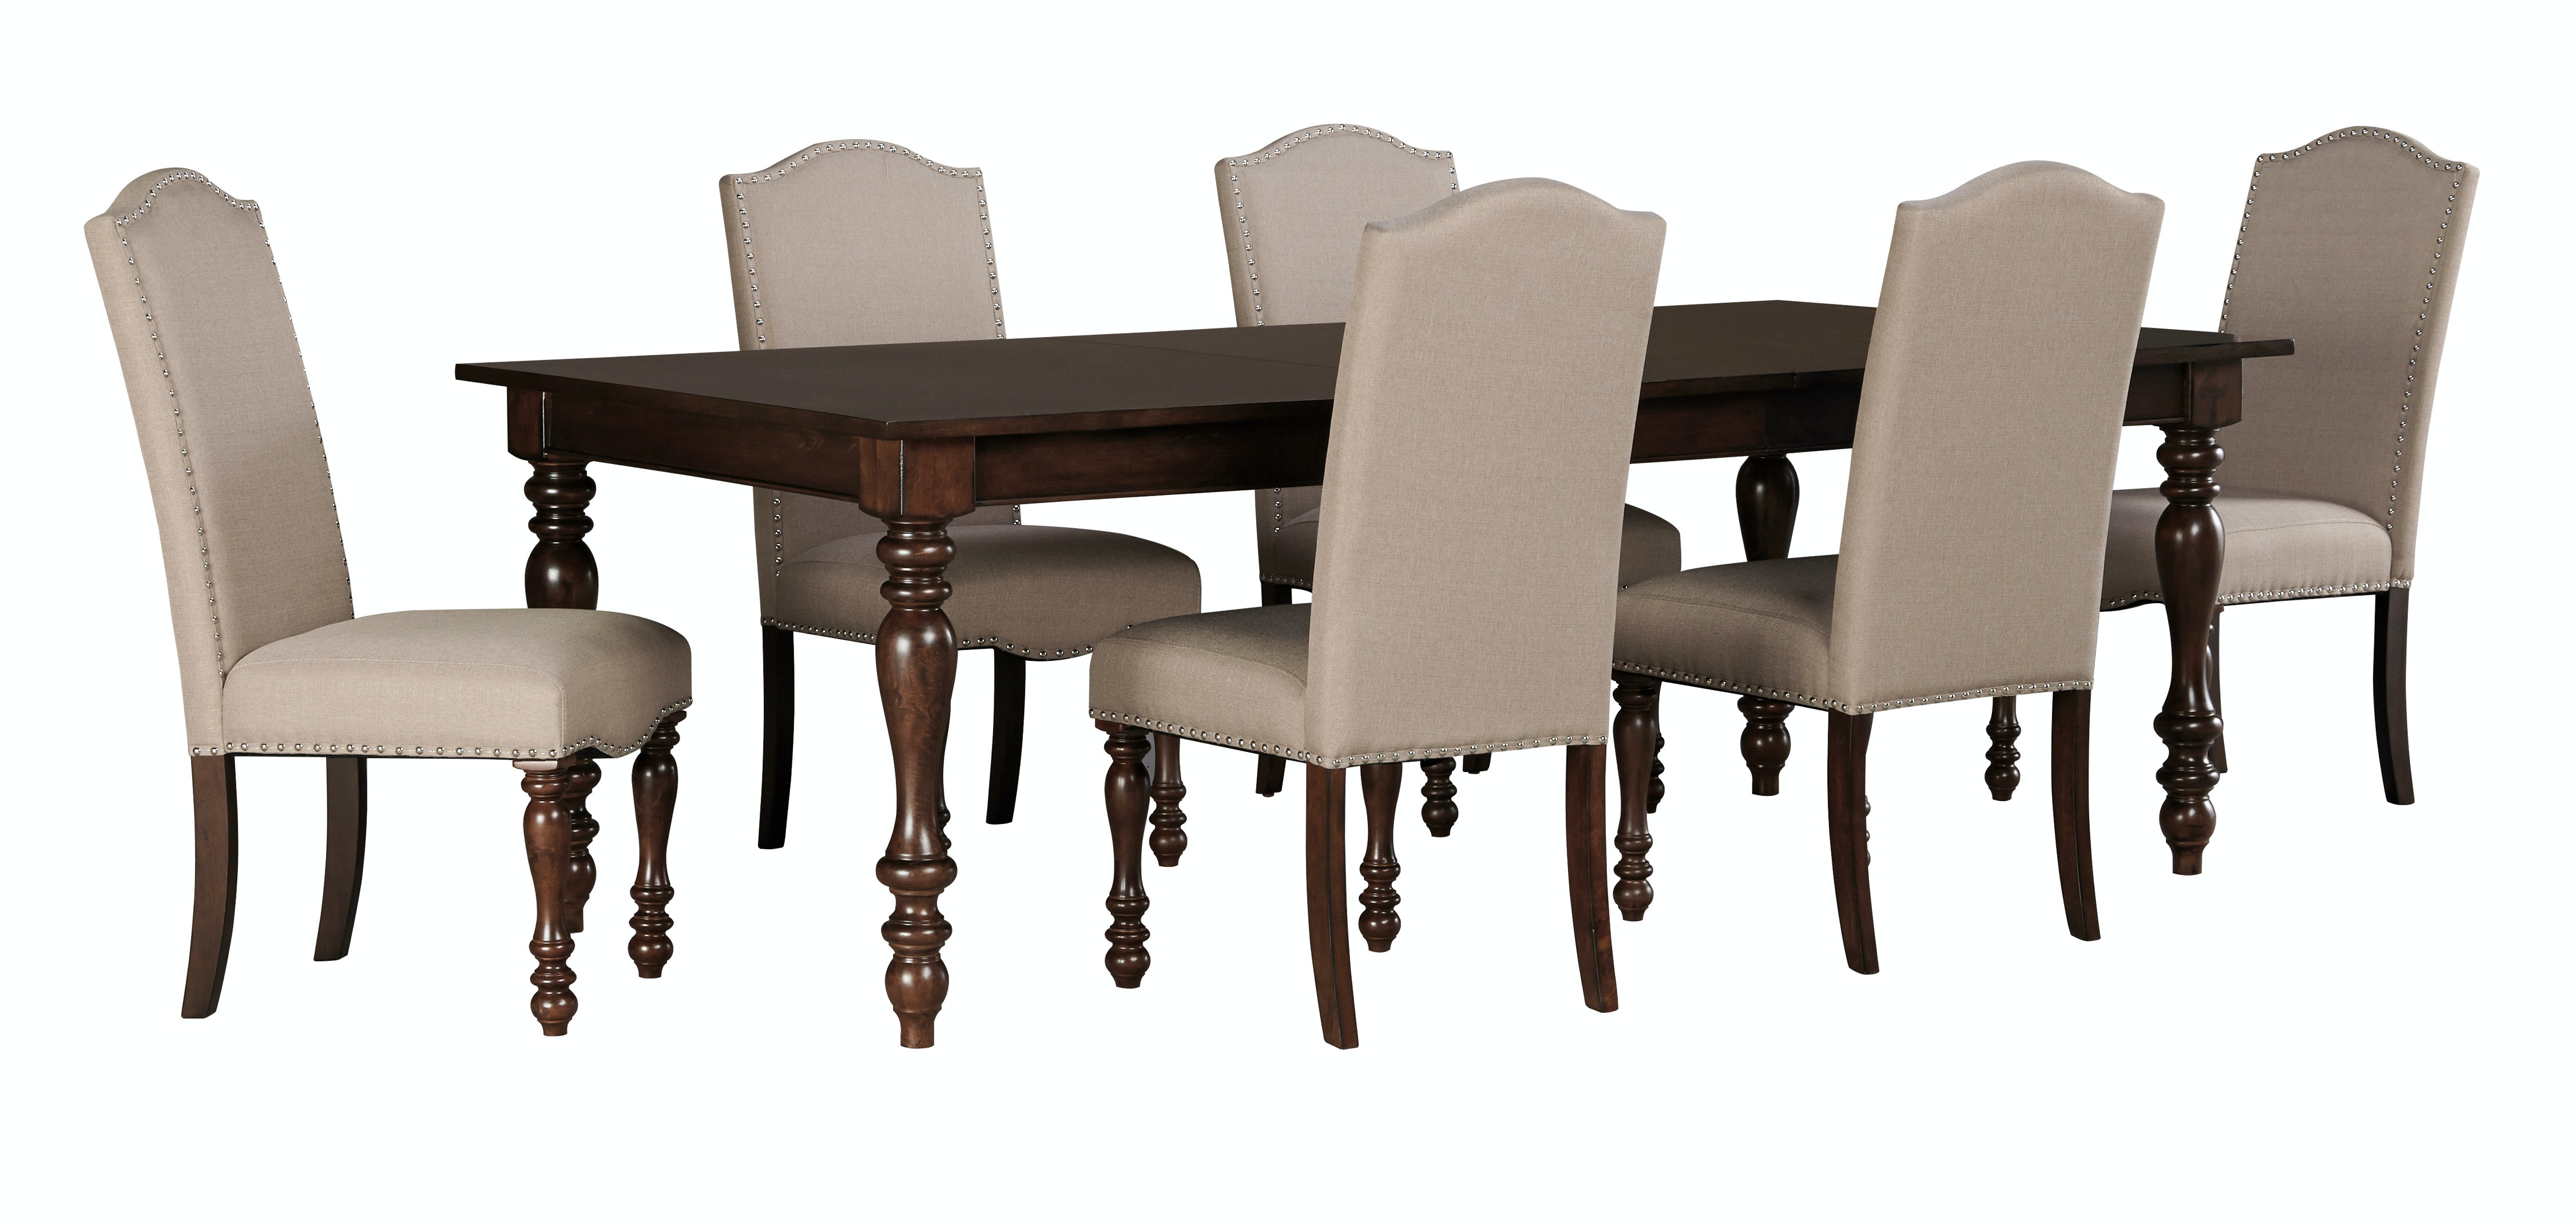 Signature Design By Ashley 7pc Baxenburg Dining Set D506 35 01(6)